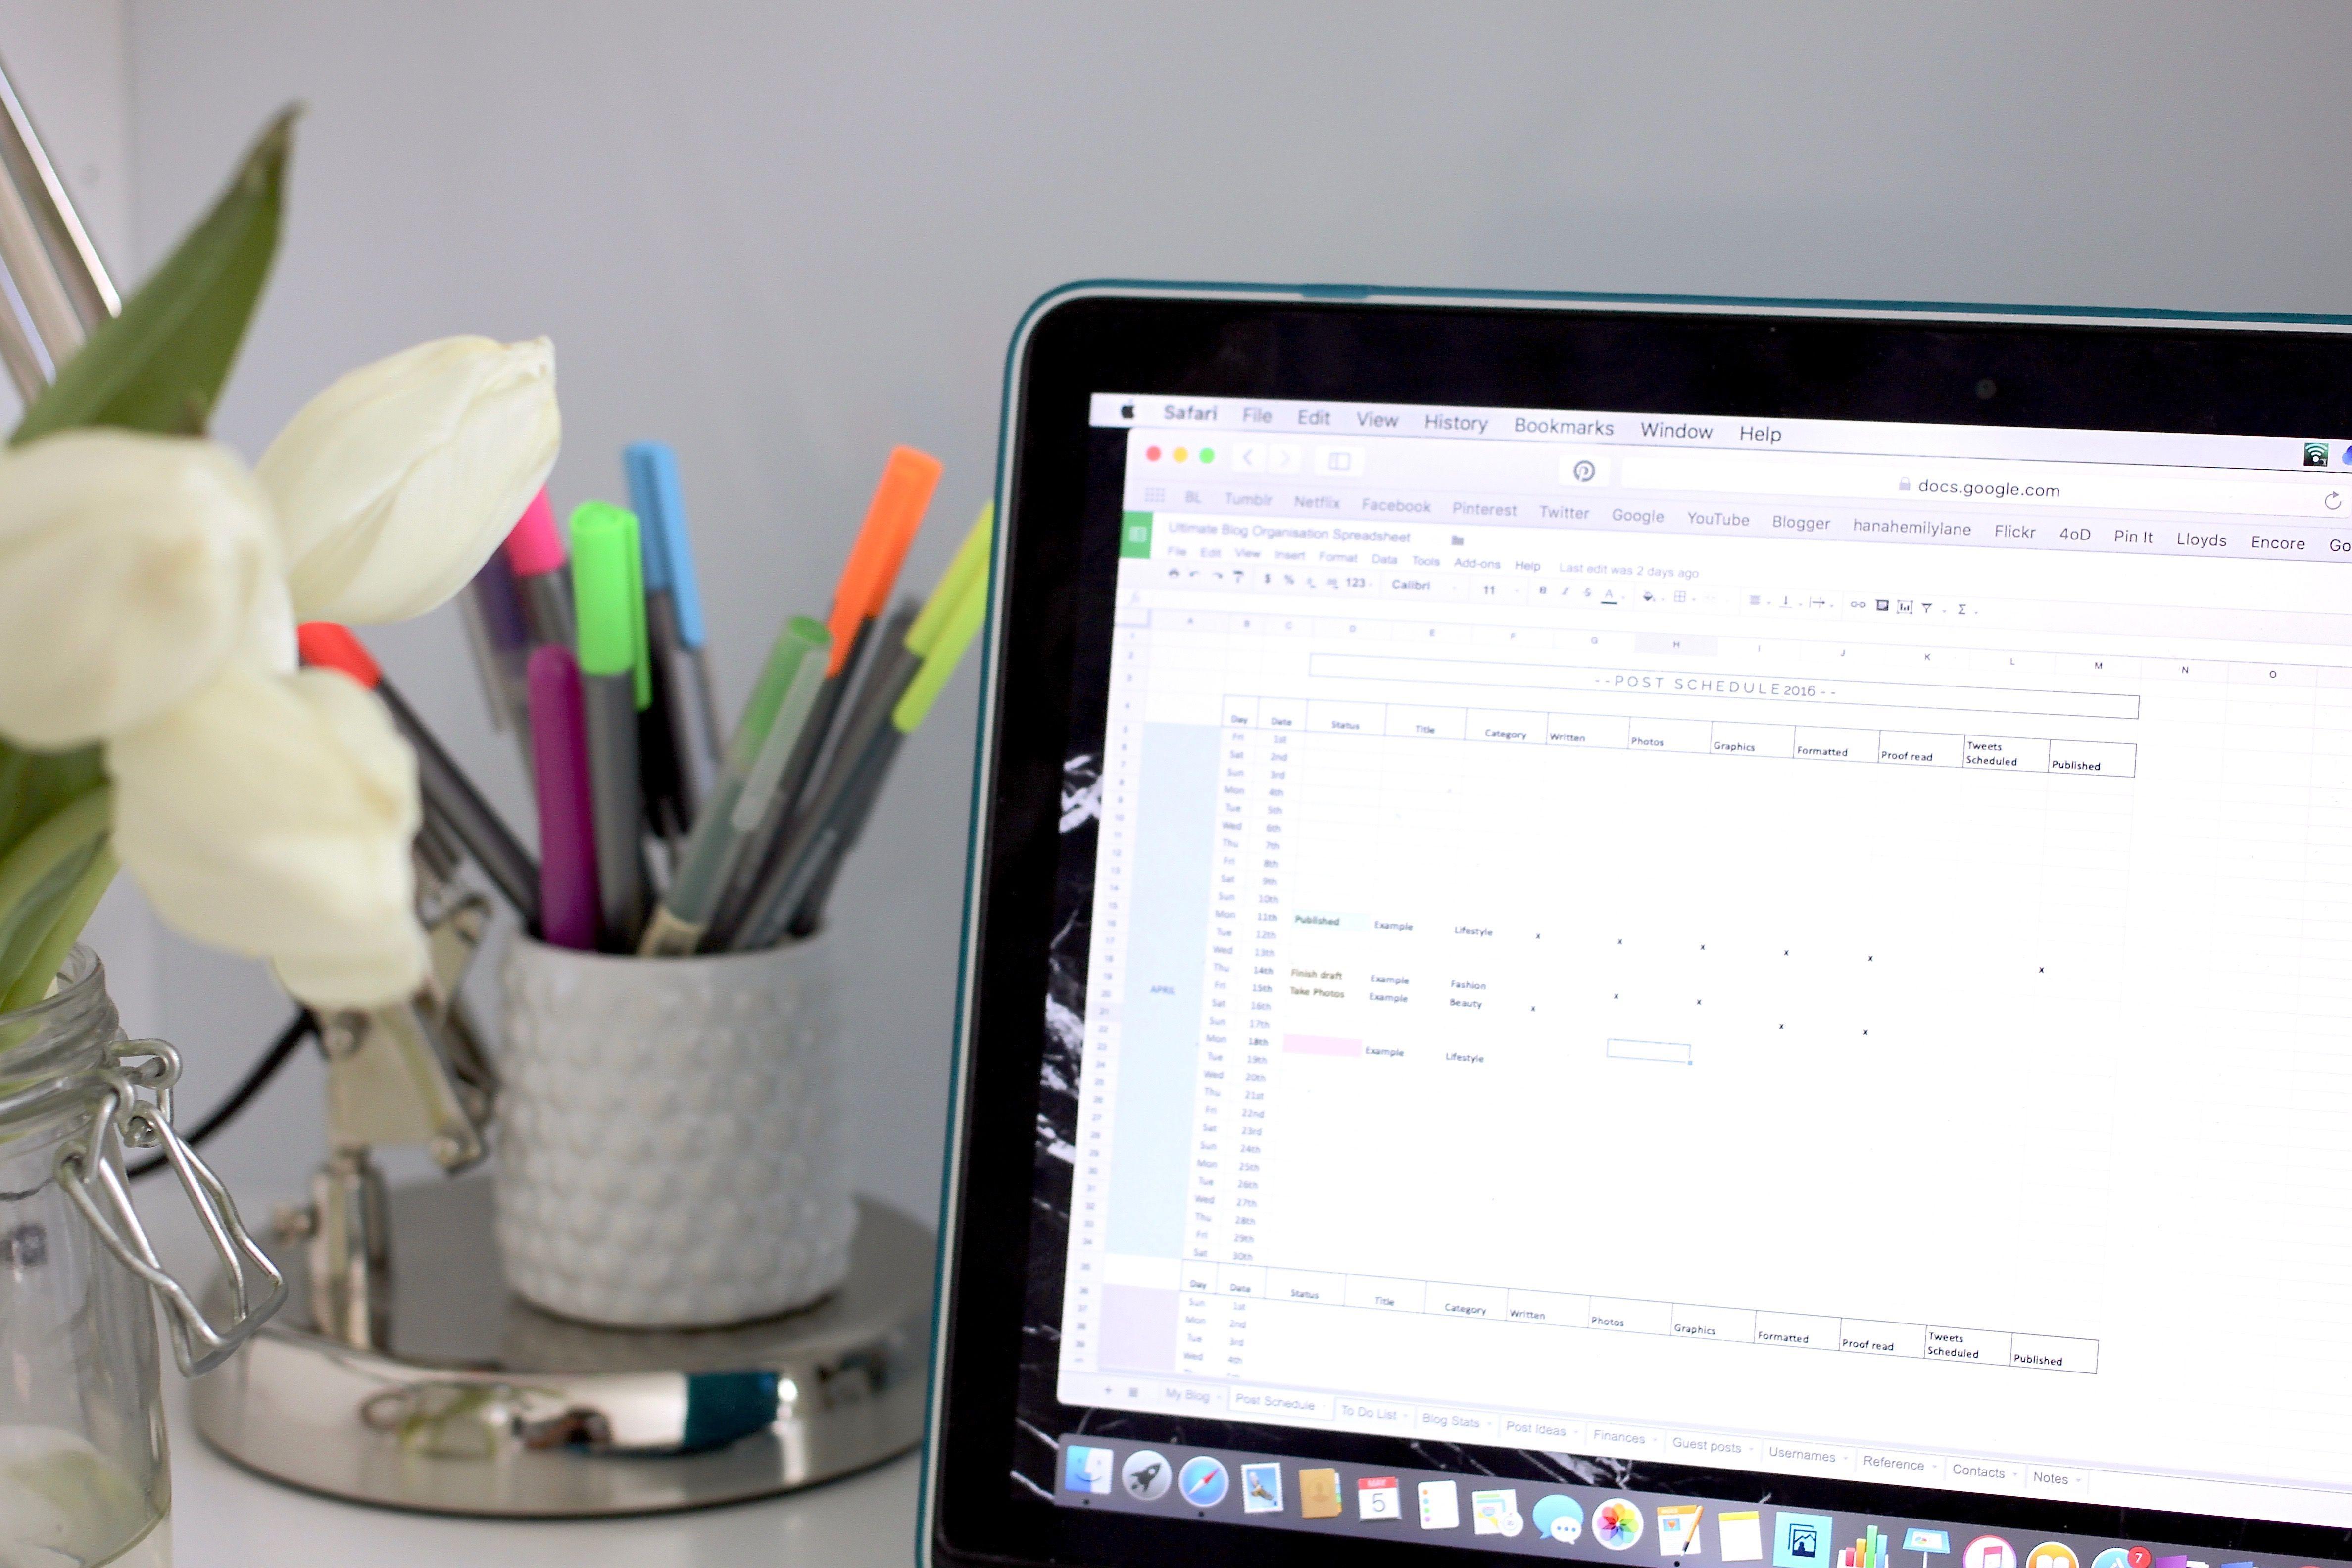 The Ultimate Blog Organisation Spreadsheet